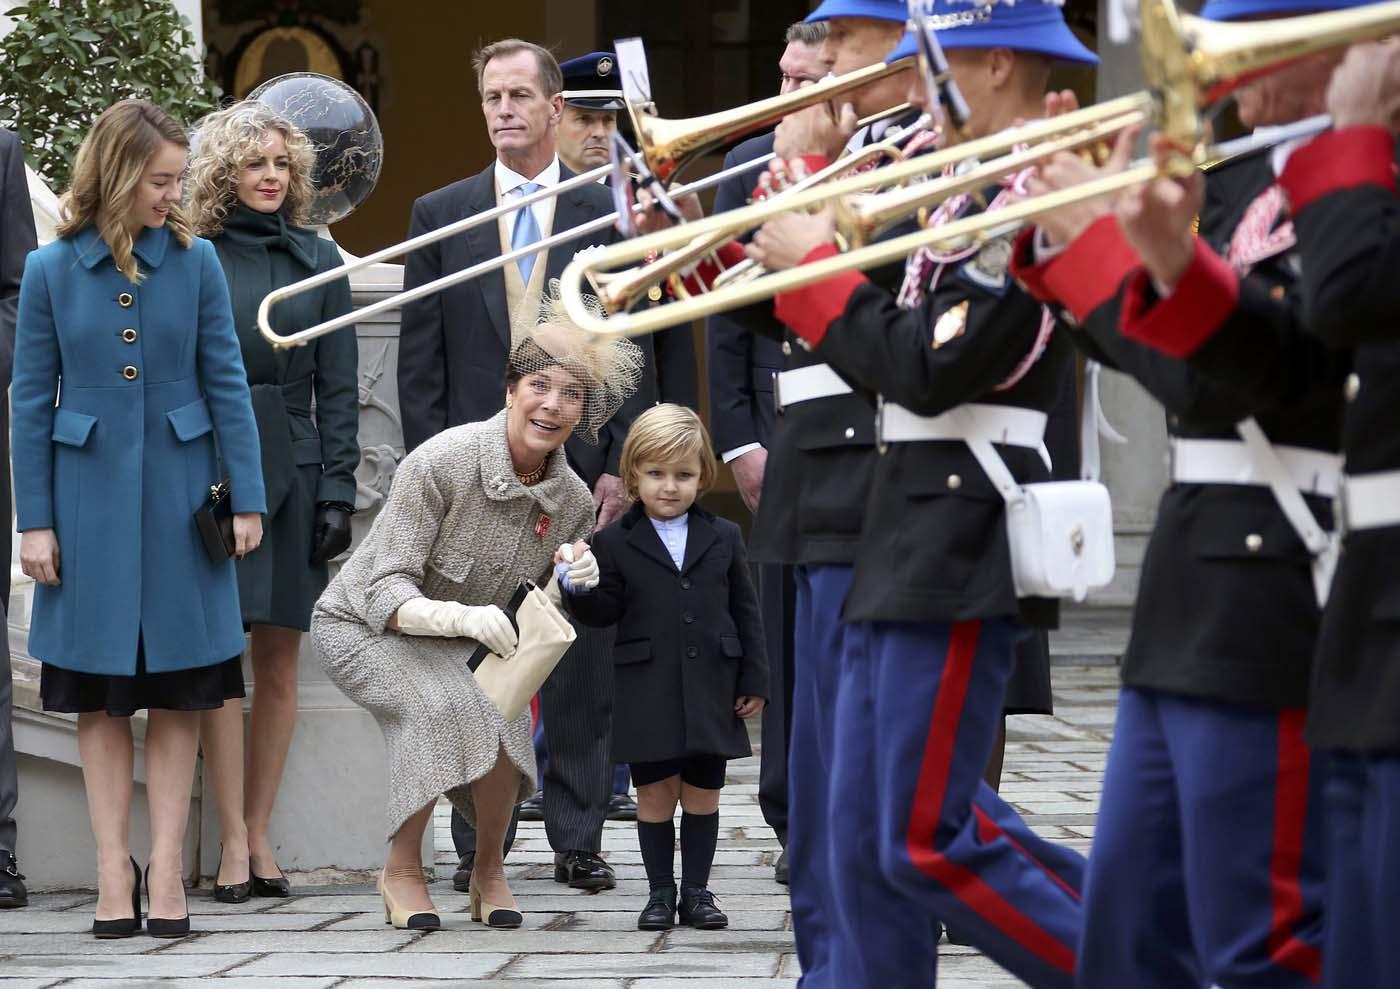 (L-R) Princess Alexandra of Hanover, Princess Caroline of Hanover and Andrea Casiraghi's son, Sacha attend the celebrations marking Monaco's National Day at the Monaco Palace November 19, 2016. REUTERS/Eric Gaillard